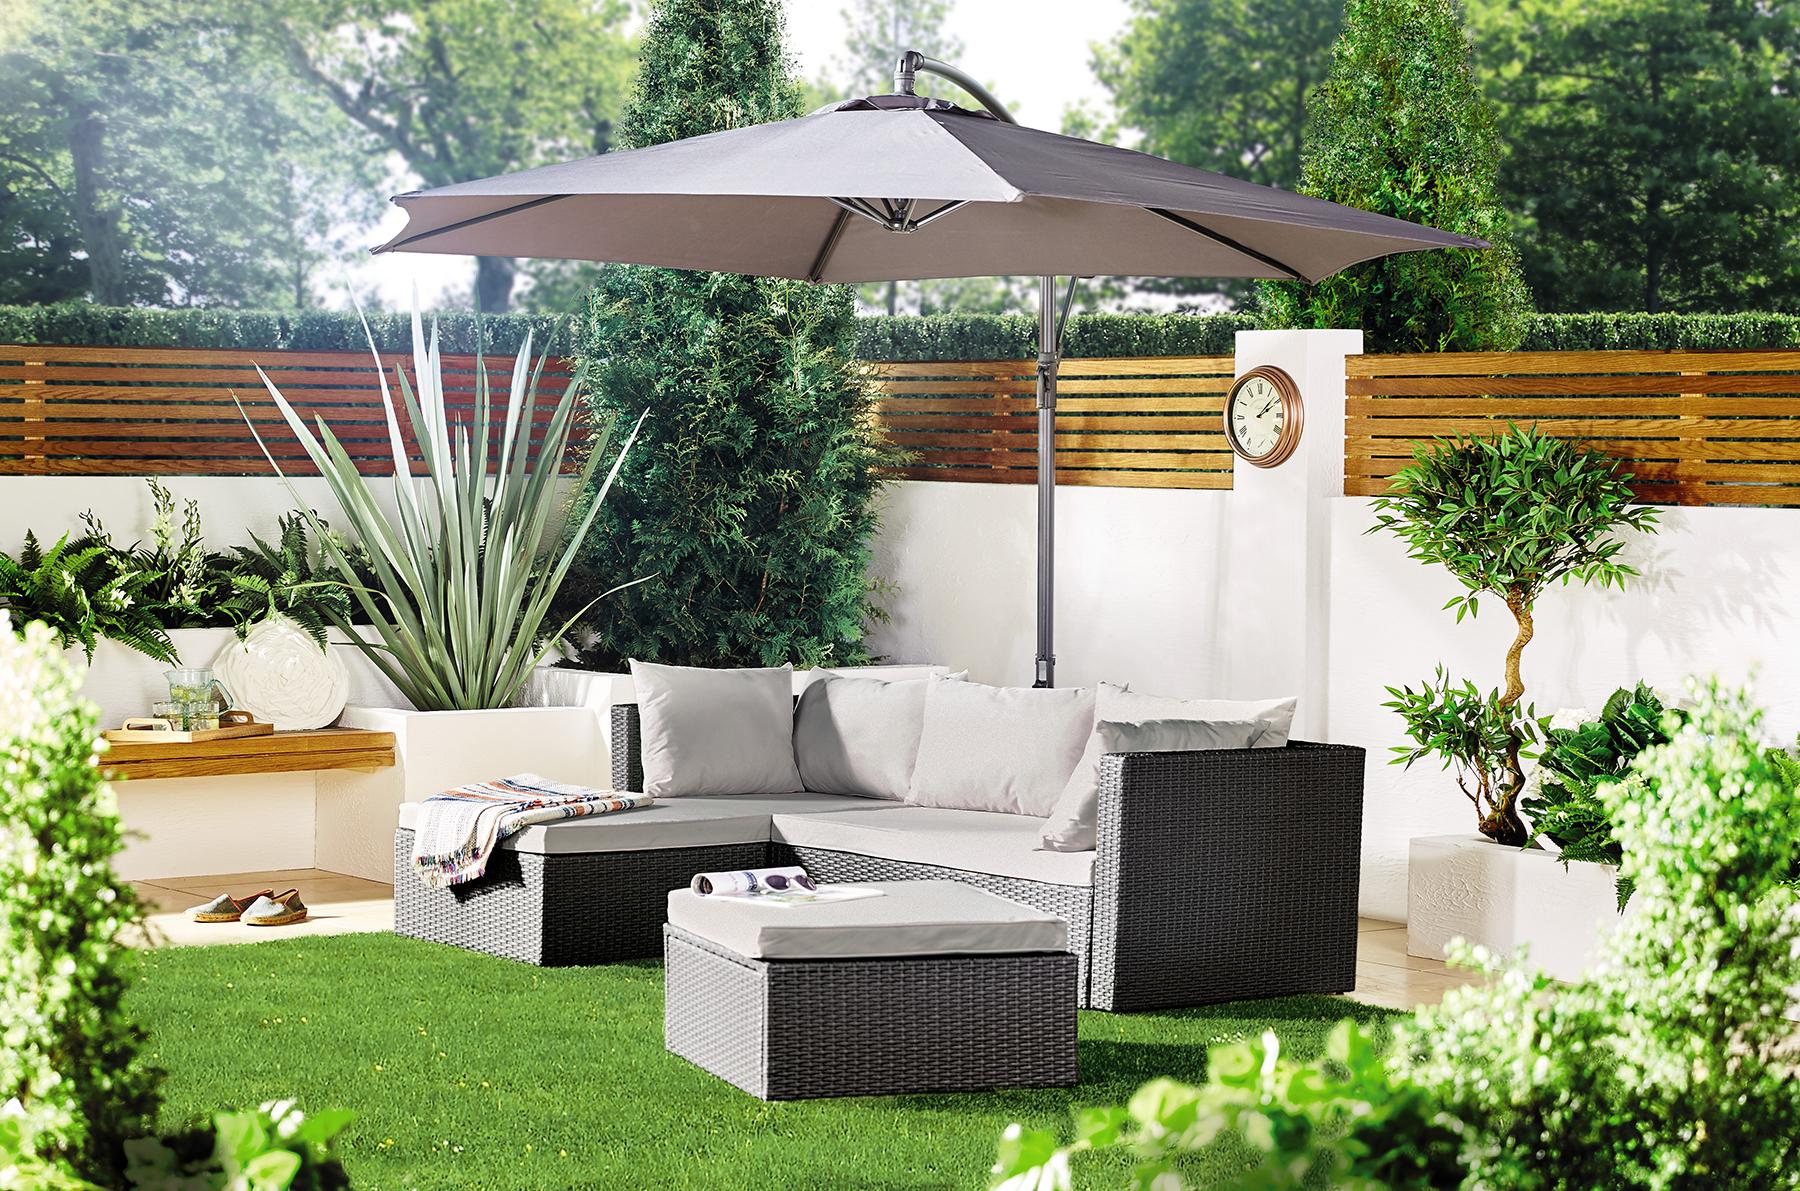 Rattan outdoor sofa and parasol. Image: Aldi